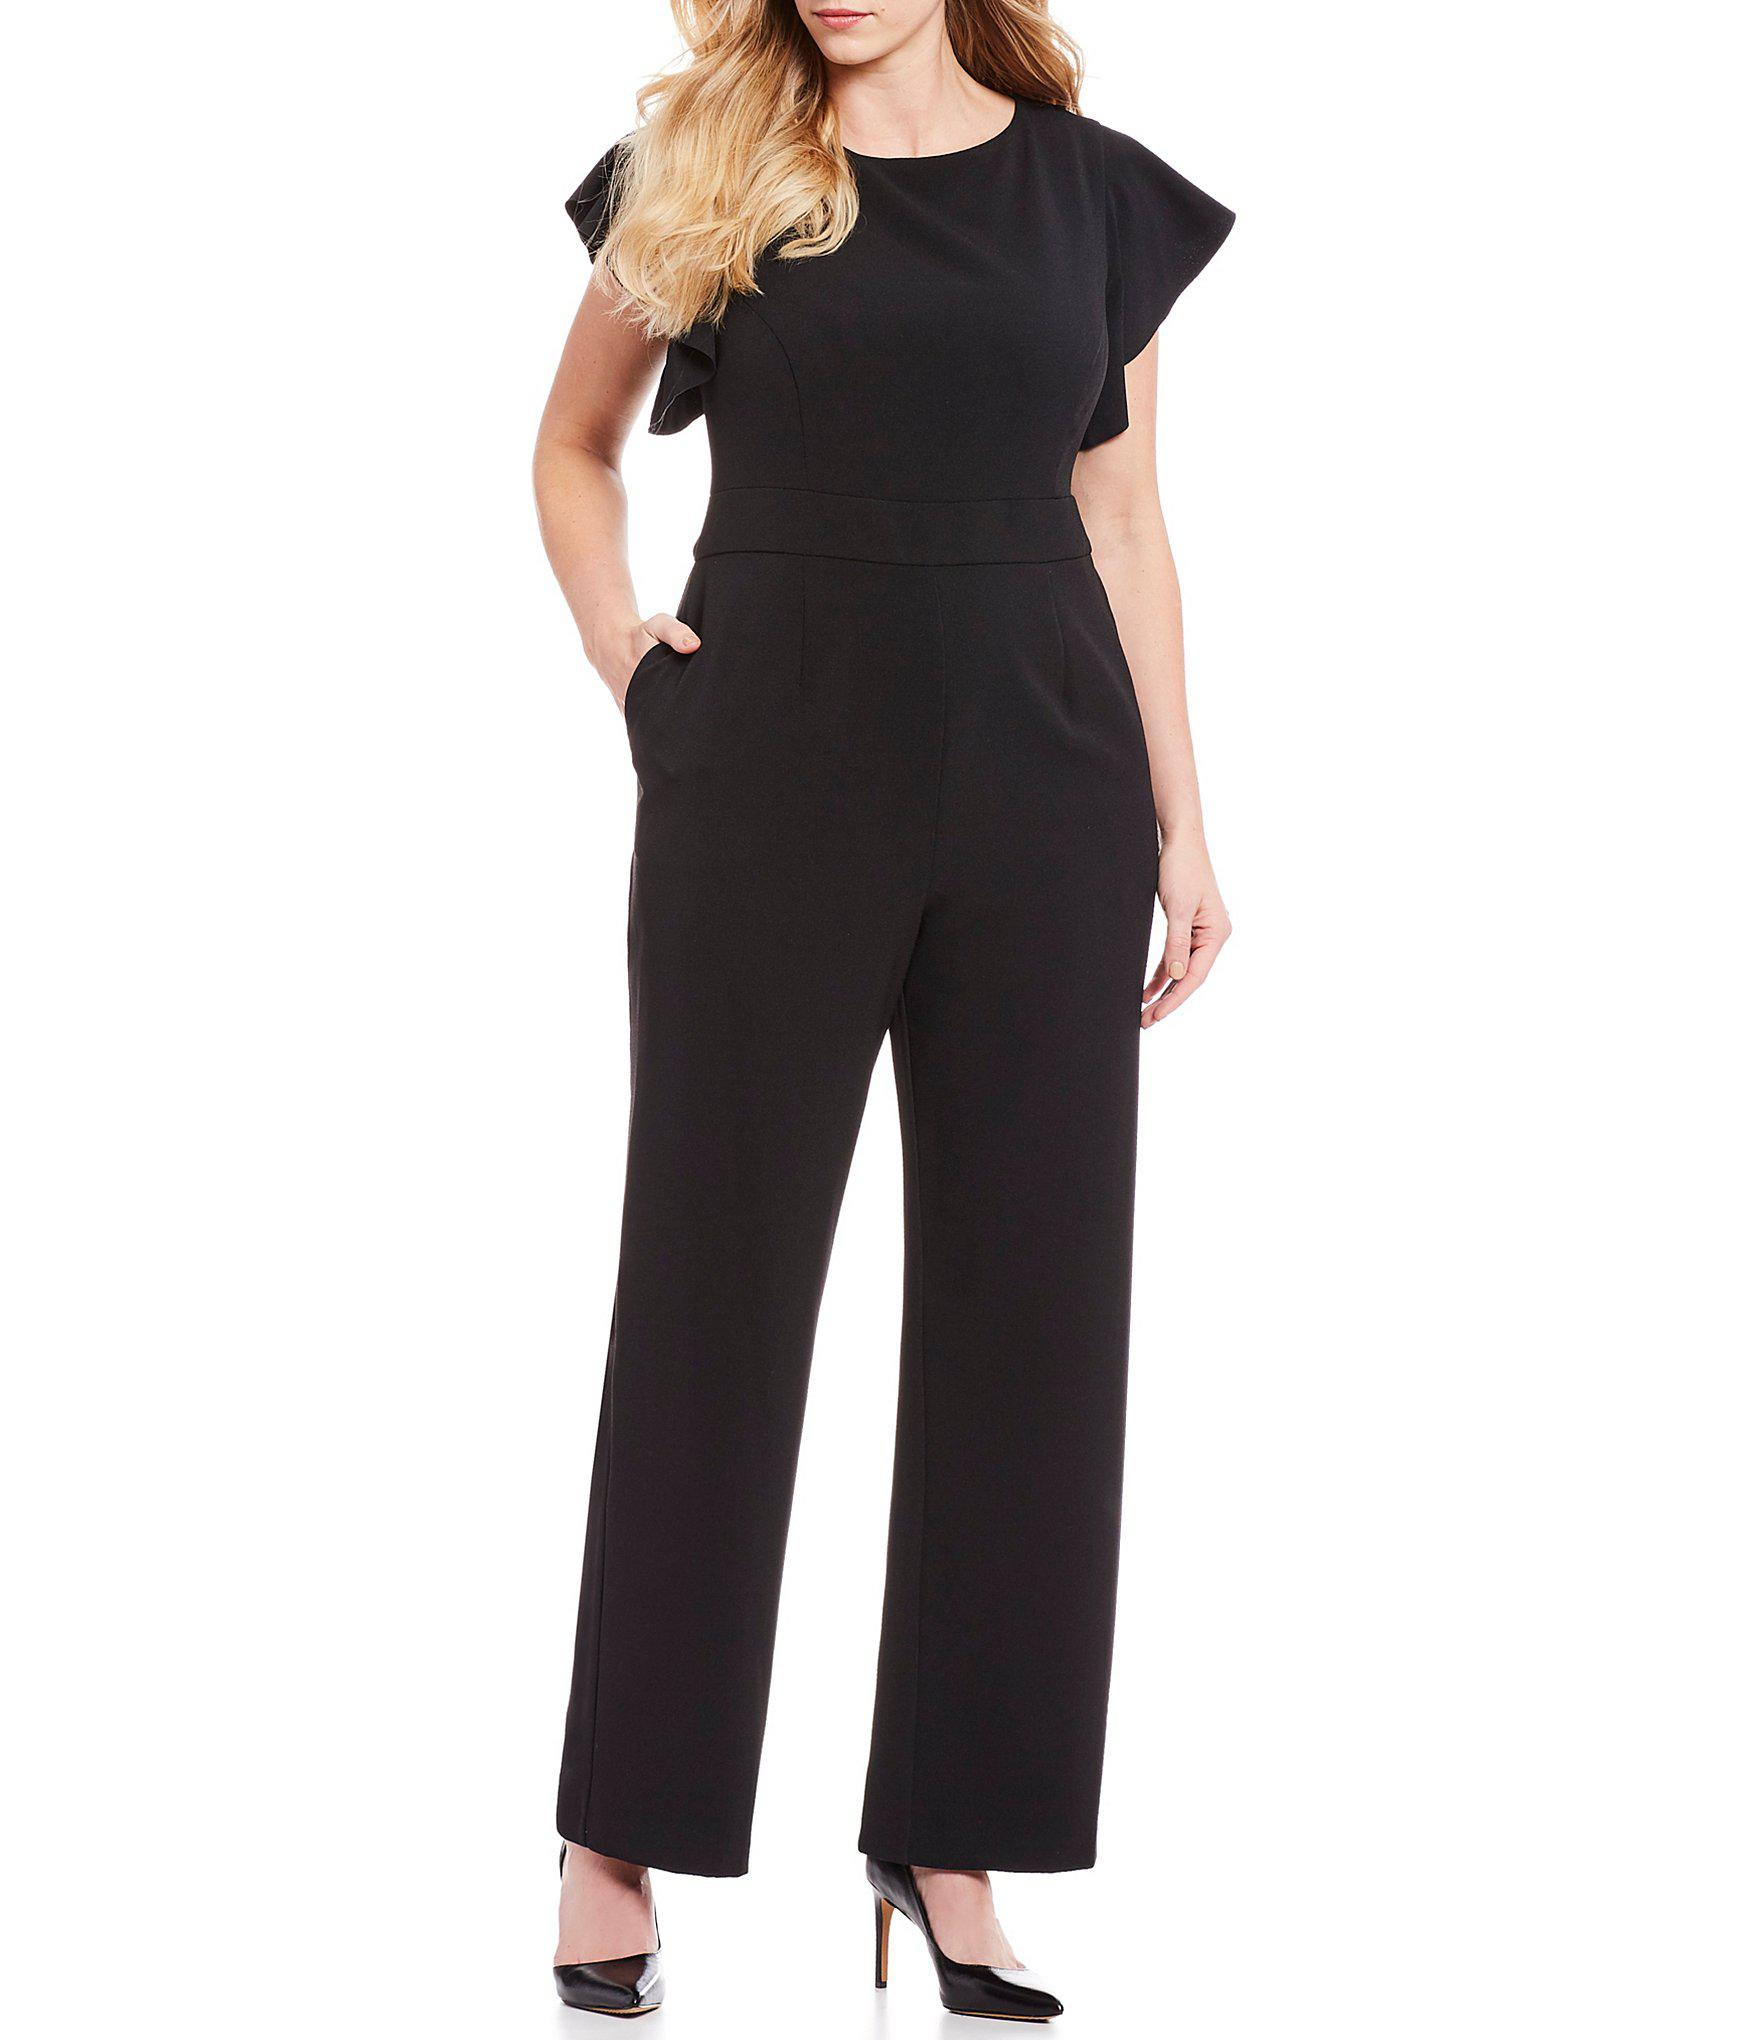 ba620cc09a0 Lyst - Vince Camuto Plus Size Flutter Sleeve Jumpsuit in Black